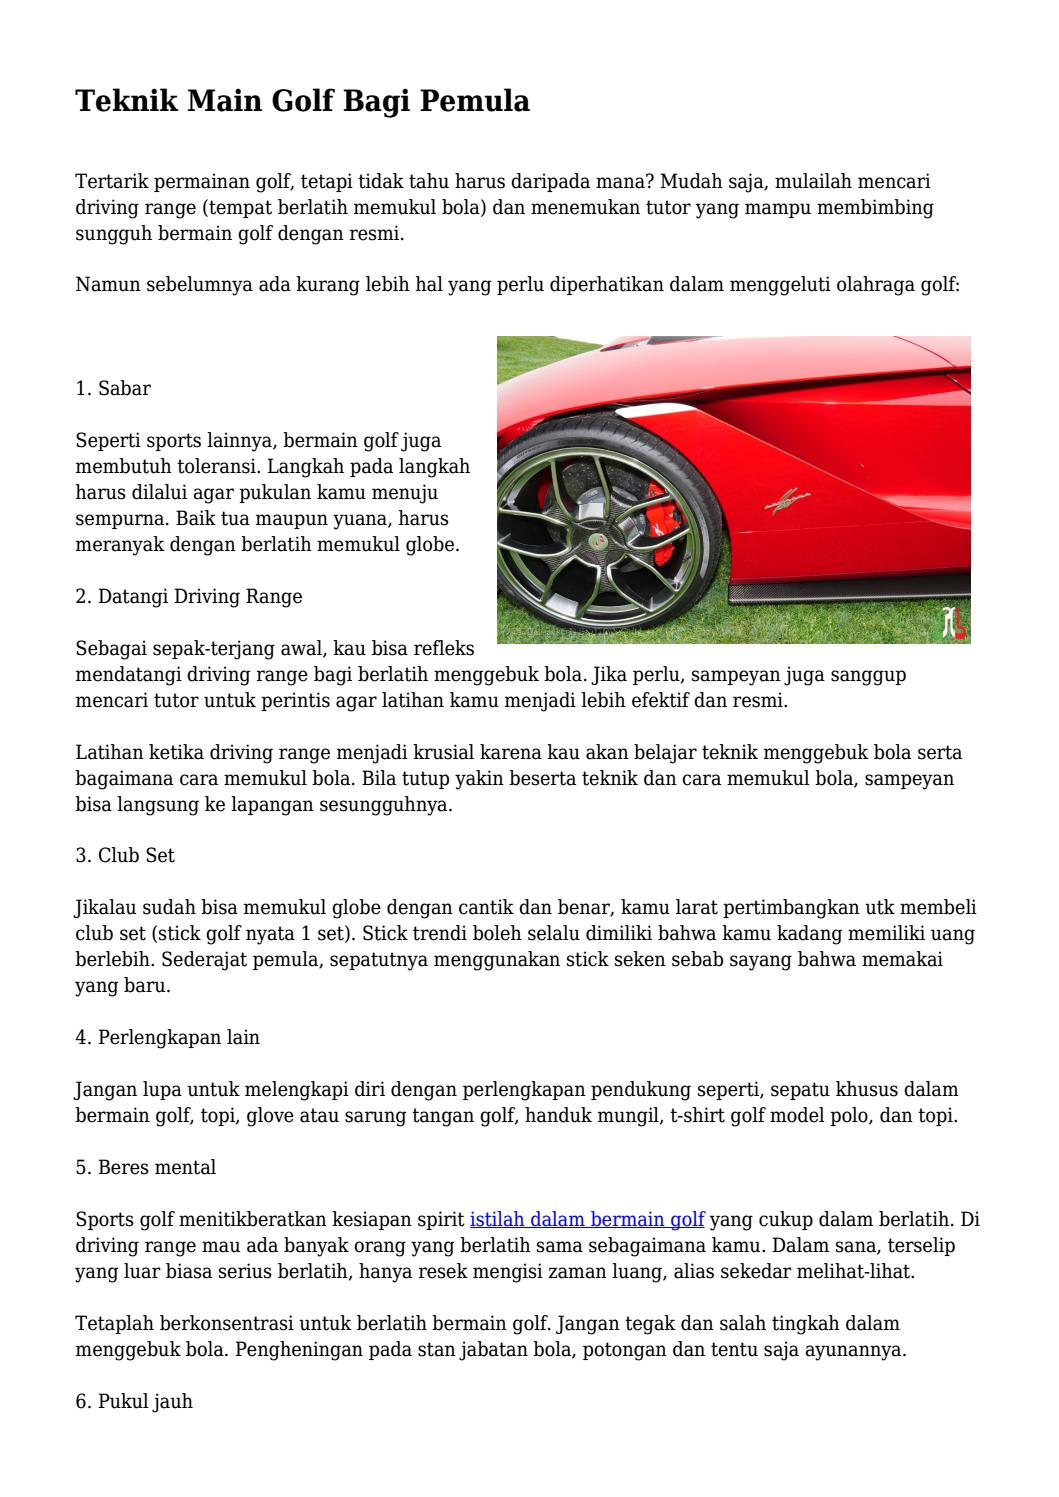 Cara Memukul Bola Golf Yang Benar : memukul, benar, Teknik, Pemula..., Pingayahidupok, Issuu